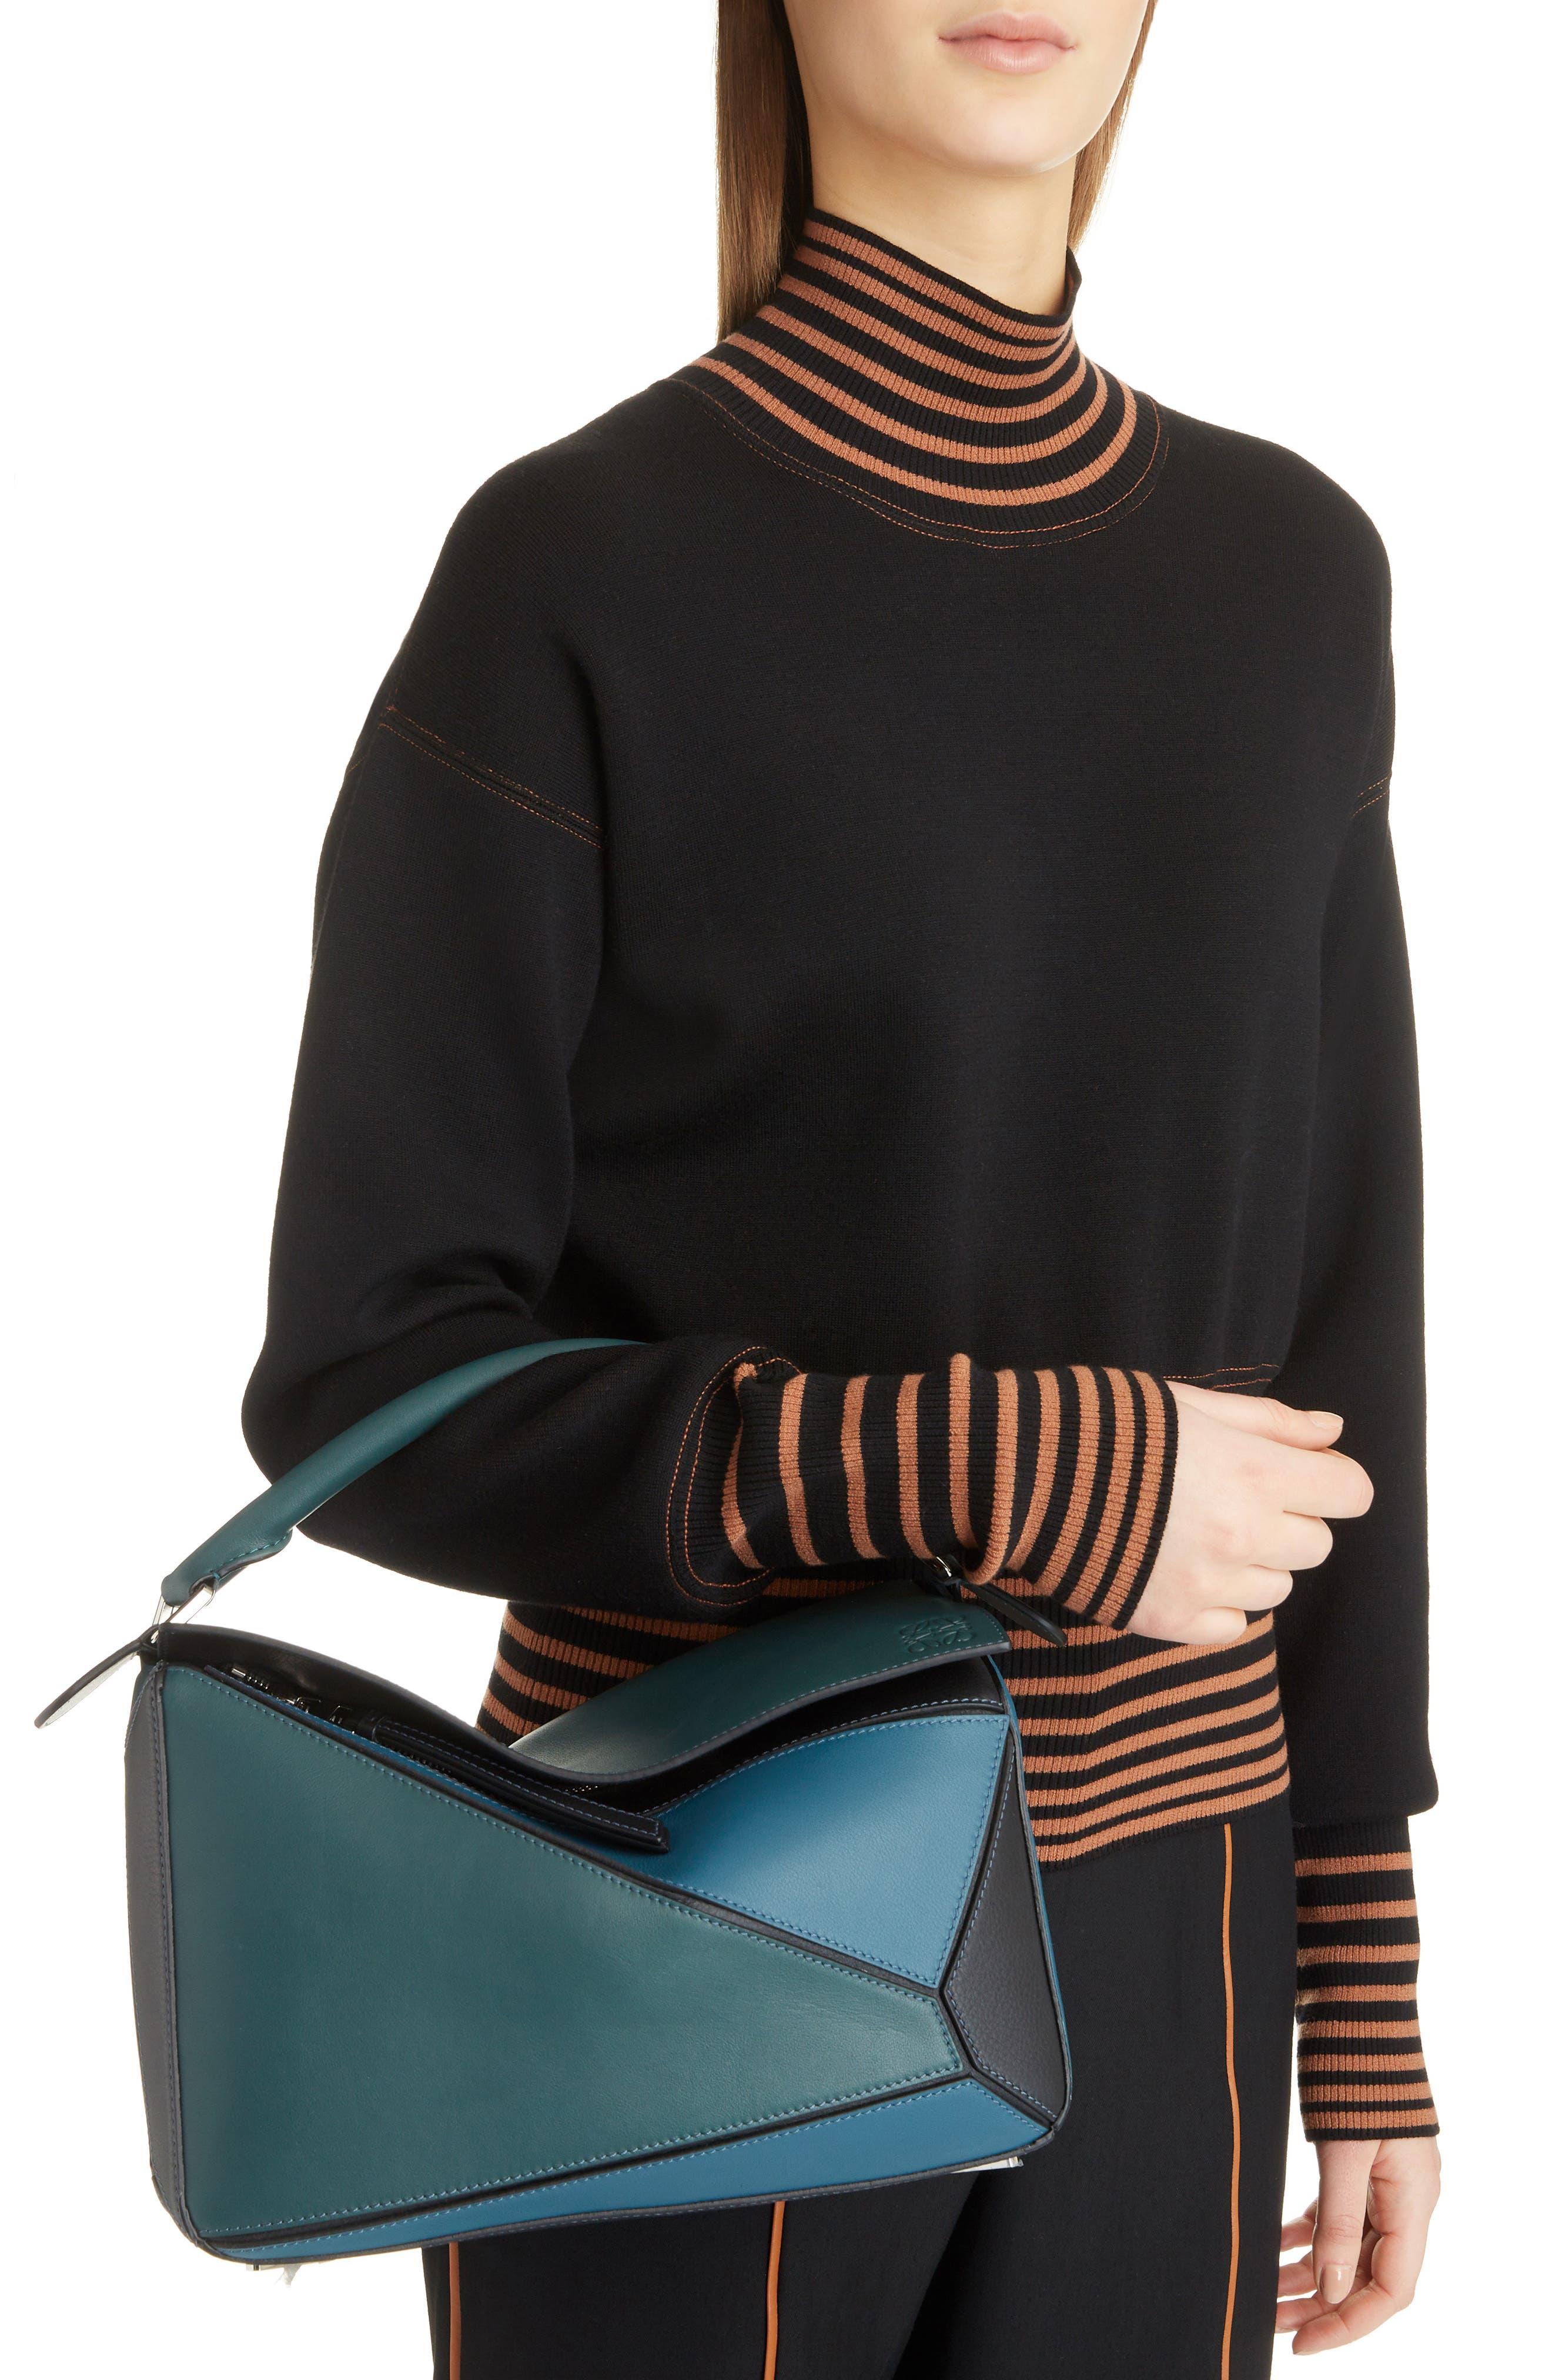 Medium Puzzle Calfskin Leather Shoulder Bag,                             Alternate thumbnail 2, color,                             PETROLEUM BLUE/ CYPRESS